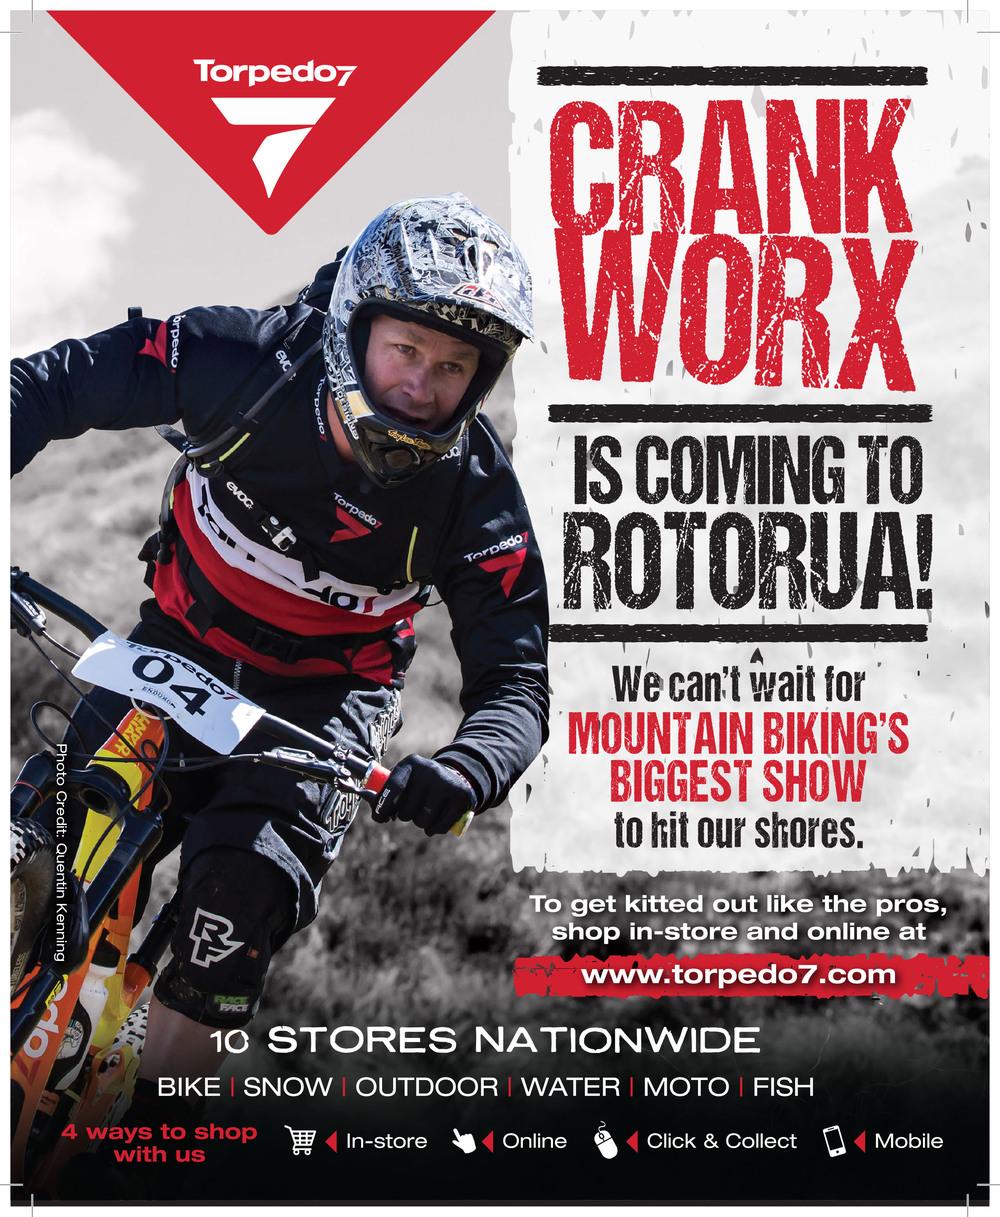 T7 Spoke Crankworx Advert in Spoke Magazine